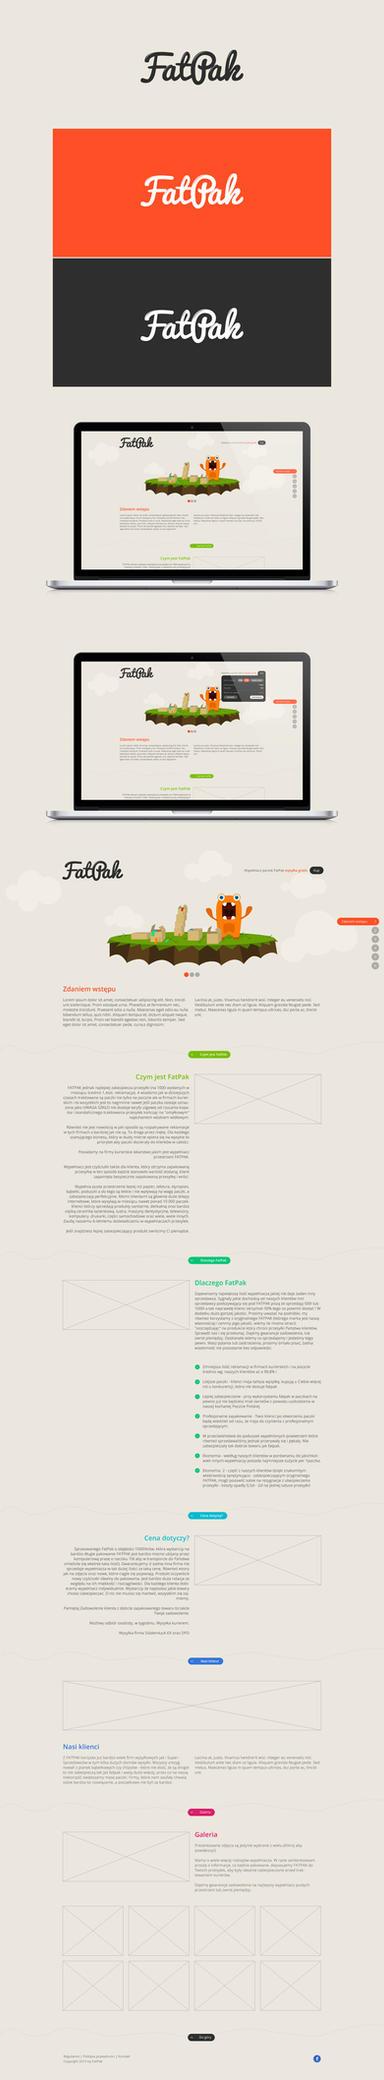 FatPak by WuHaDesign